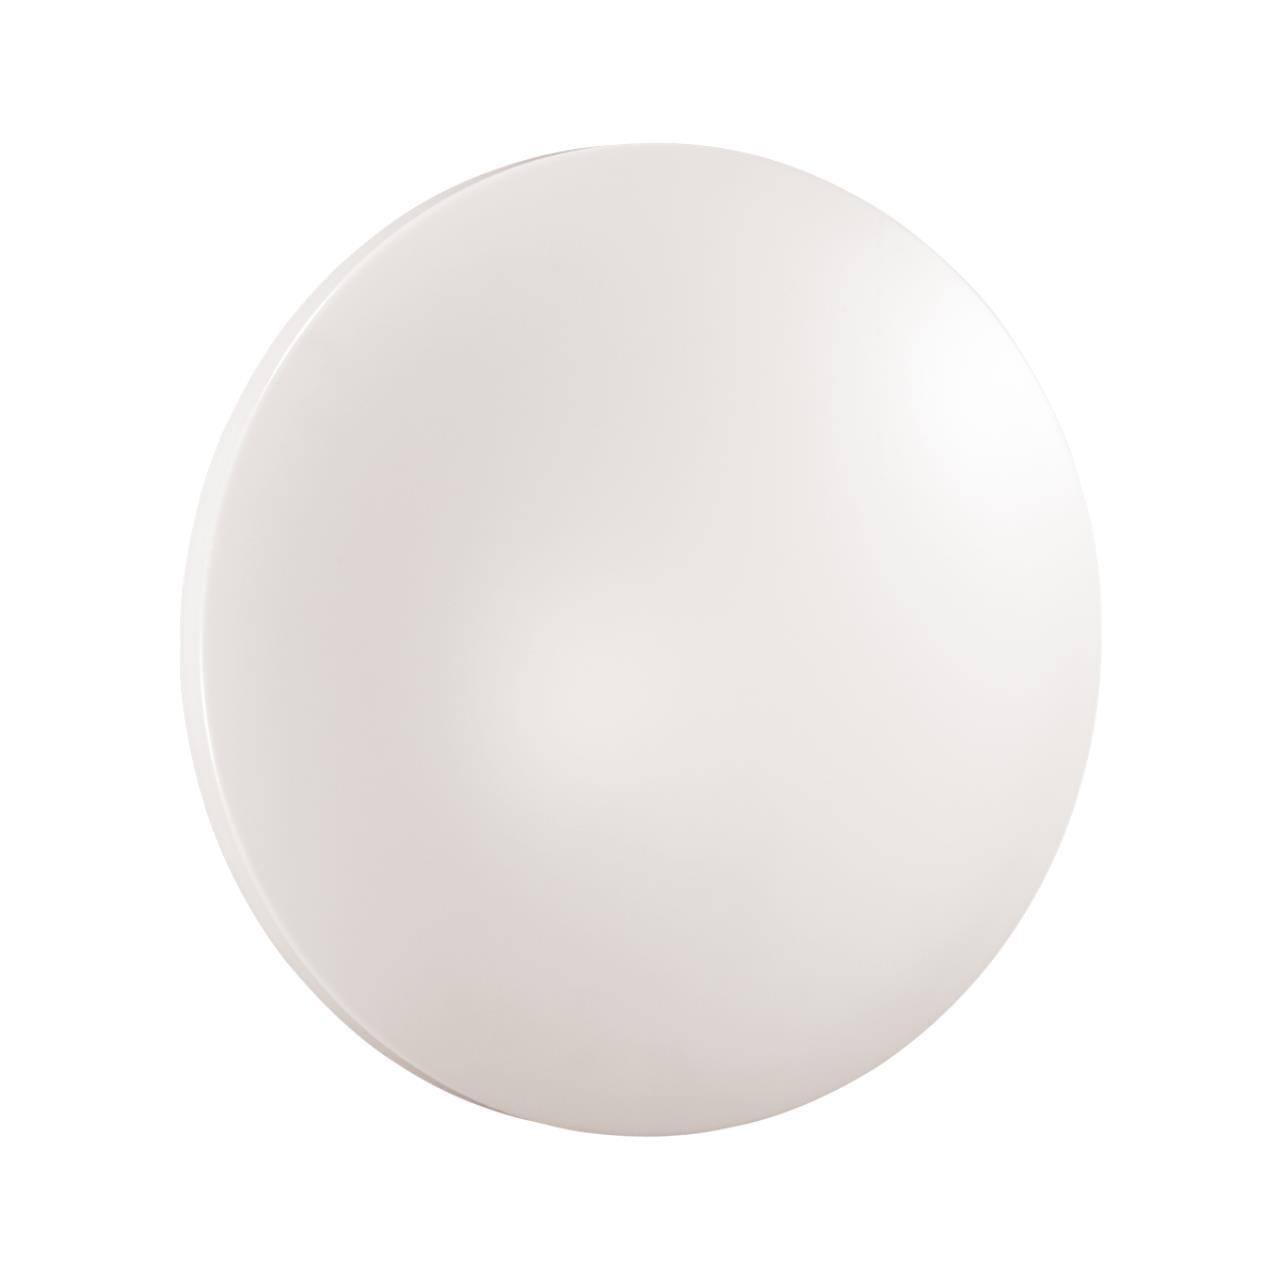 3017/DL SN 033 св-к SIMPLE пластик LED 48Вт 4000K D400 IP43